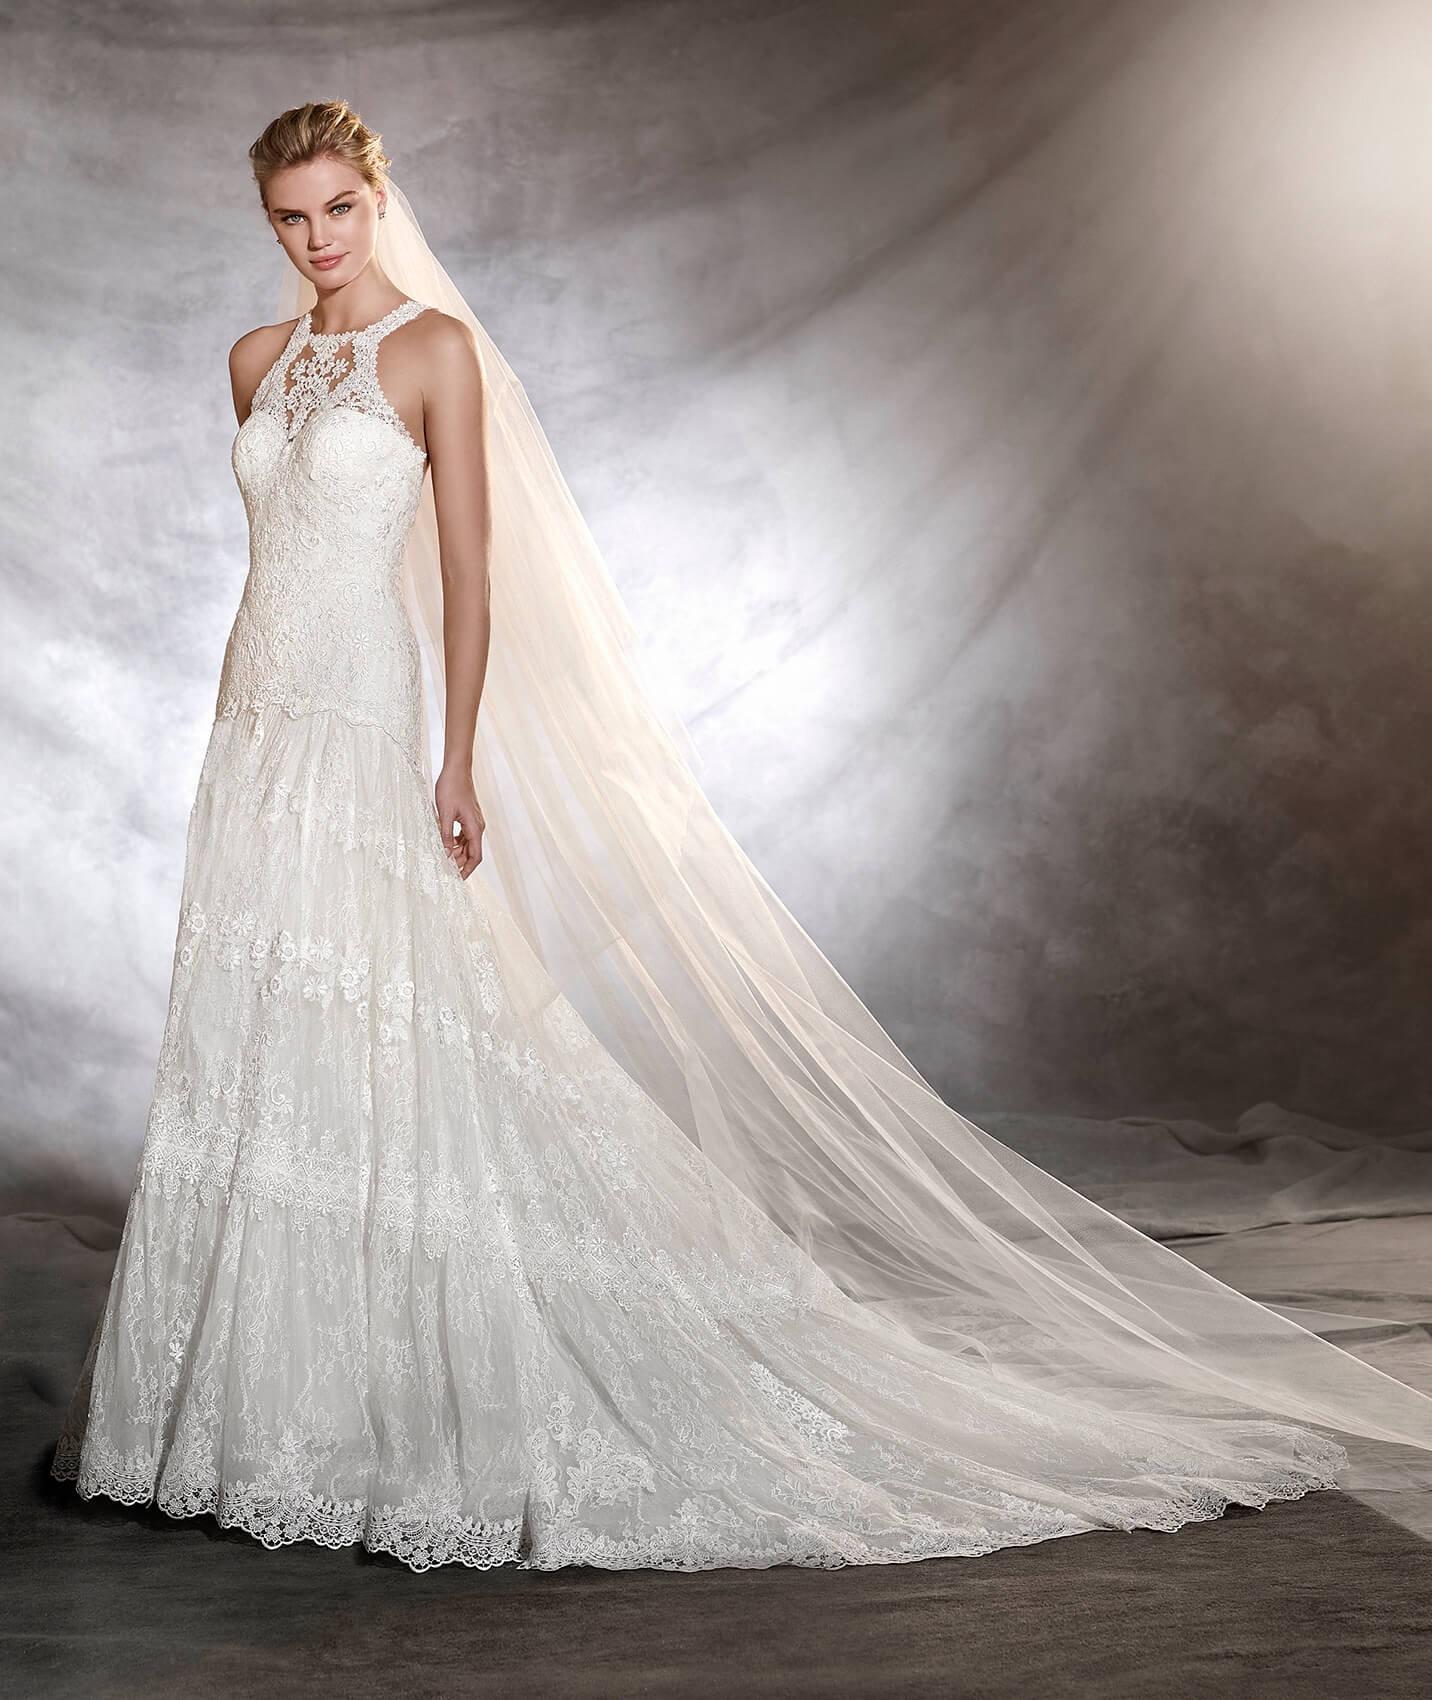 Osorno vestuvinė suknelė